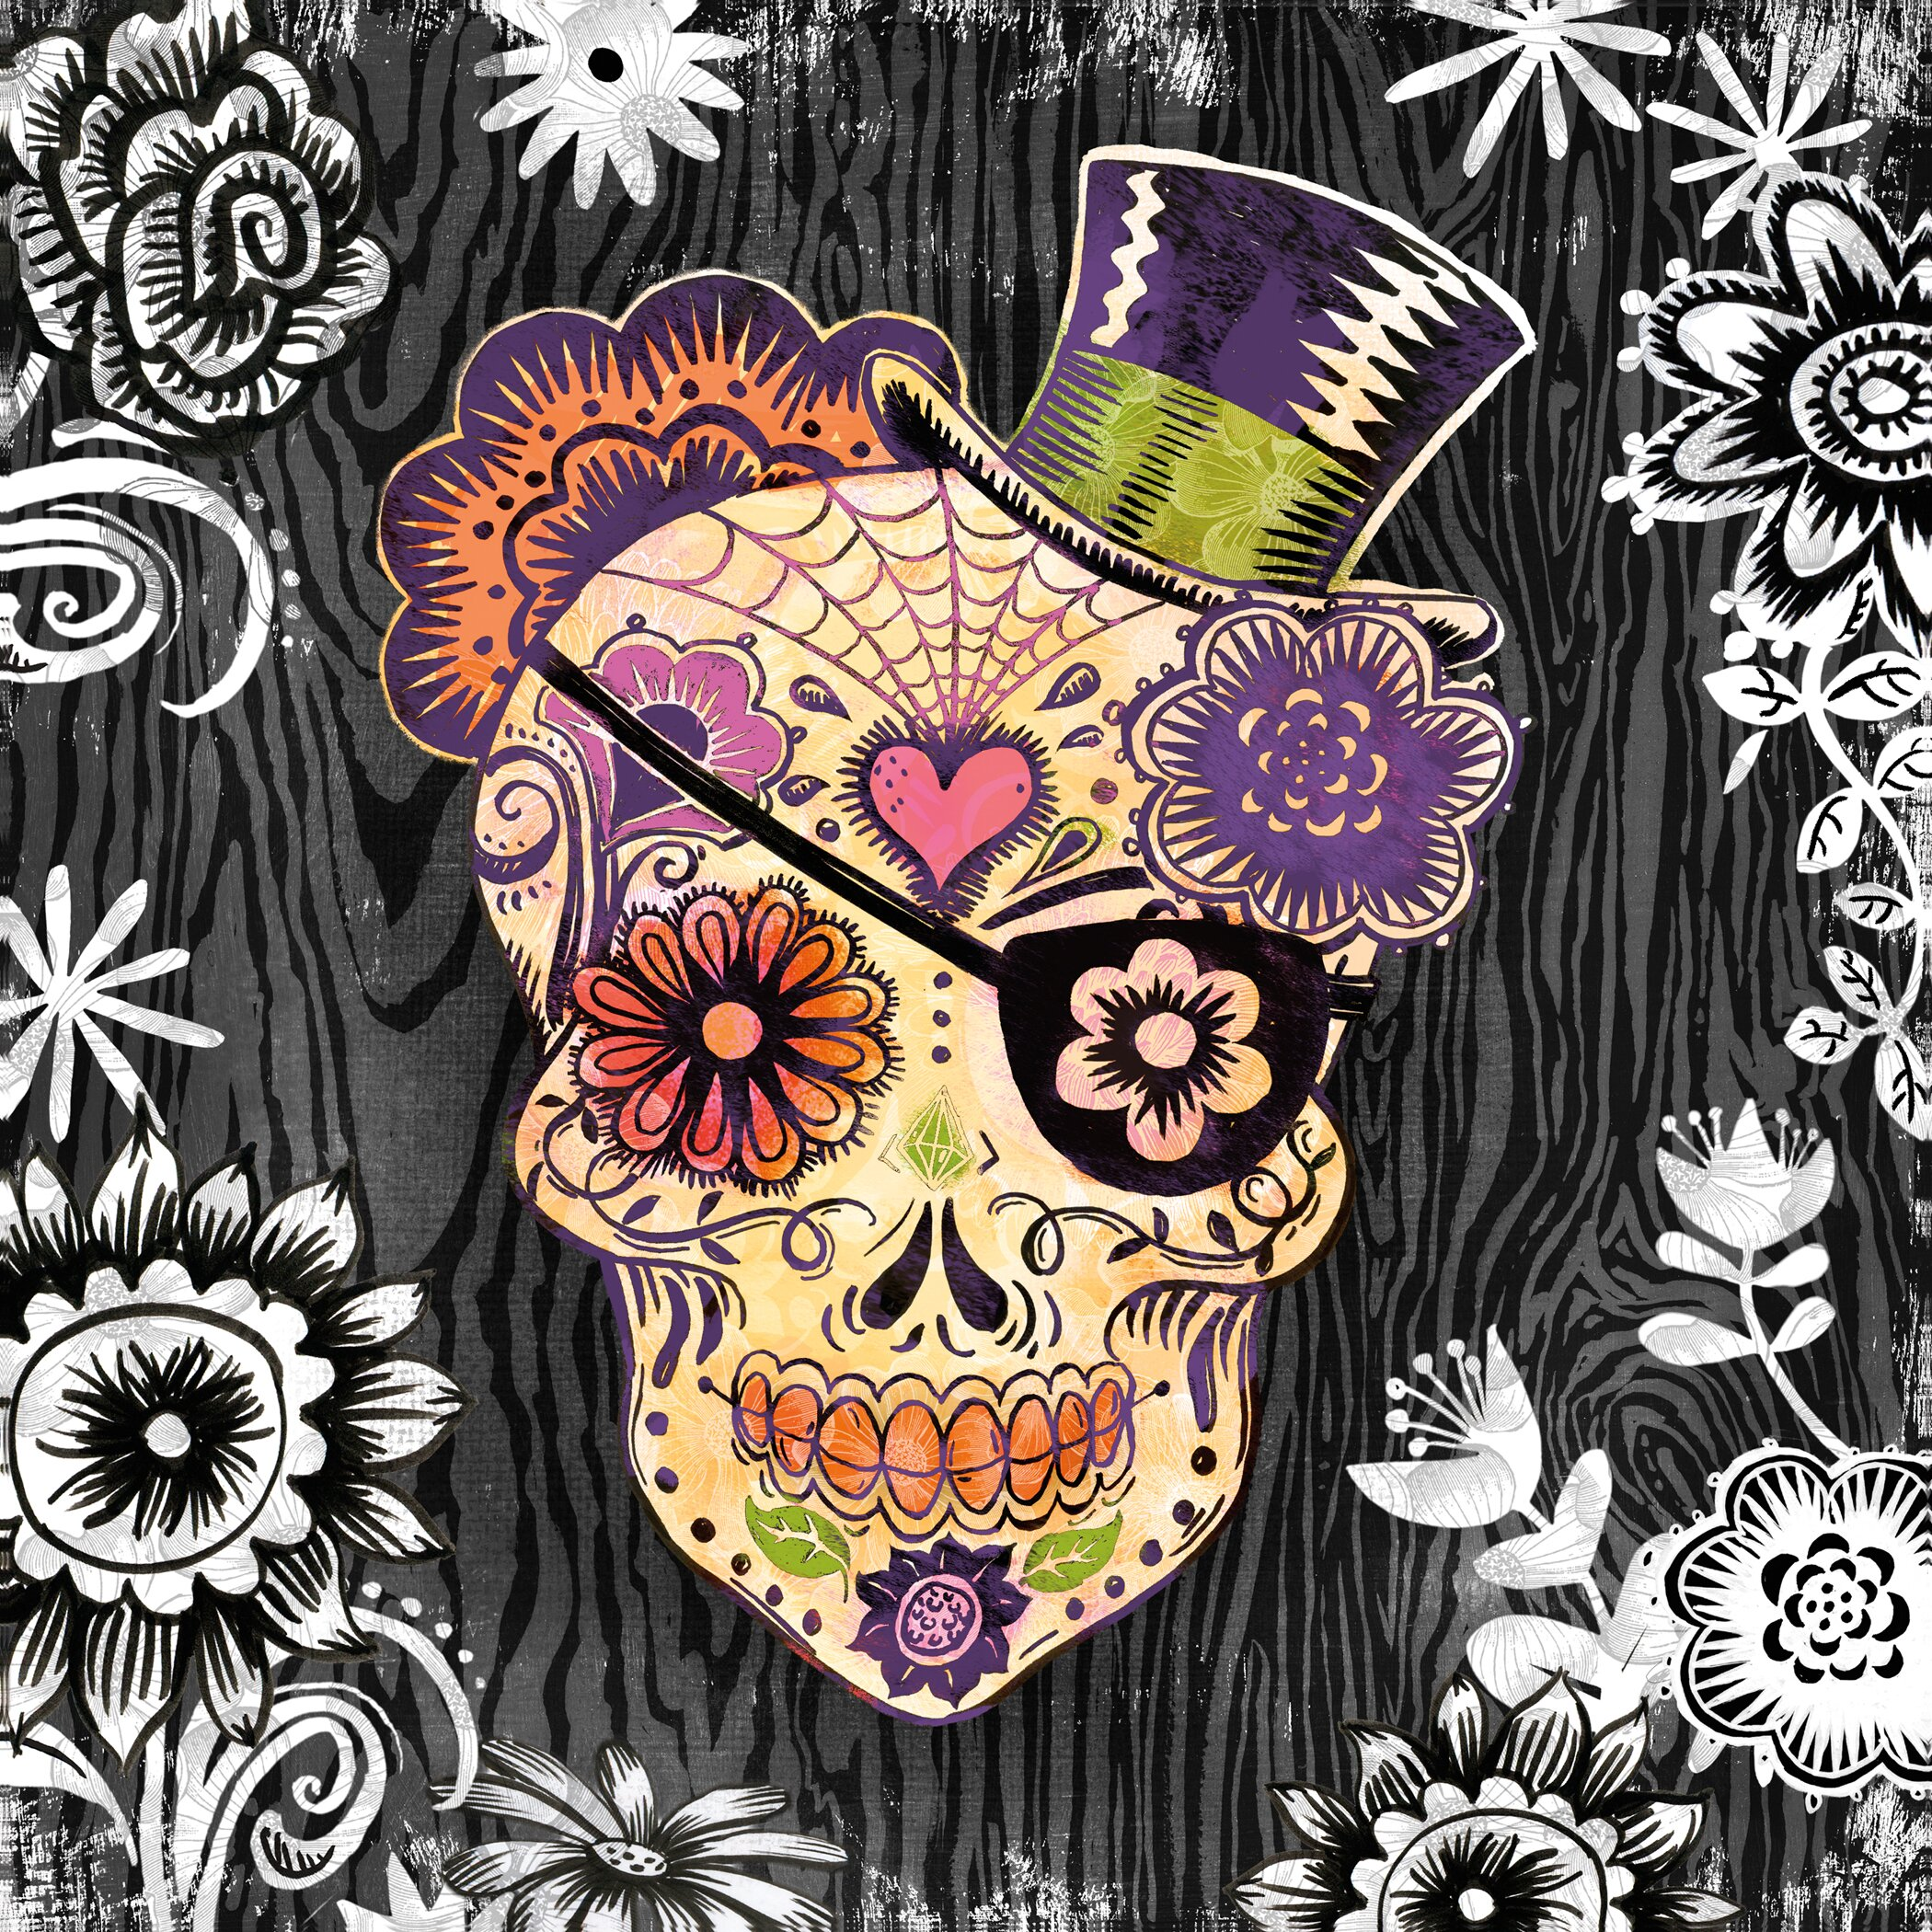 Portfolio canvas sugar skull daisy by geoff allen graphic art on wrapped canvas wayfair - Tete mort mexicaine ...